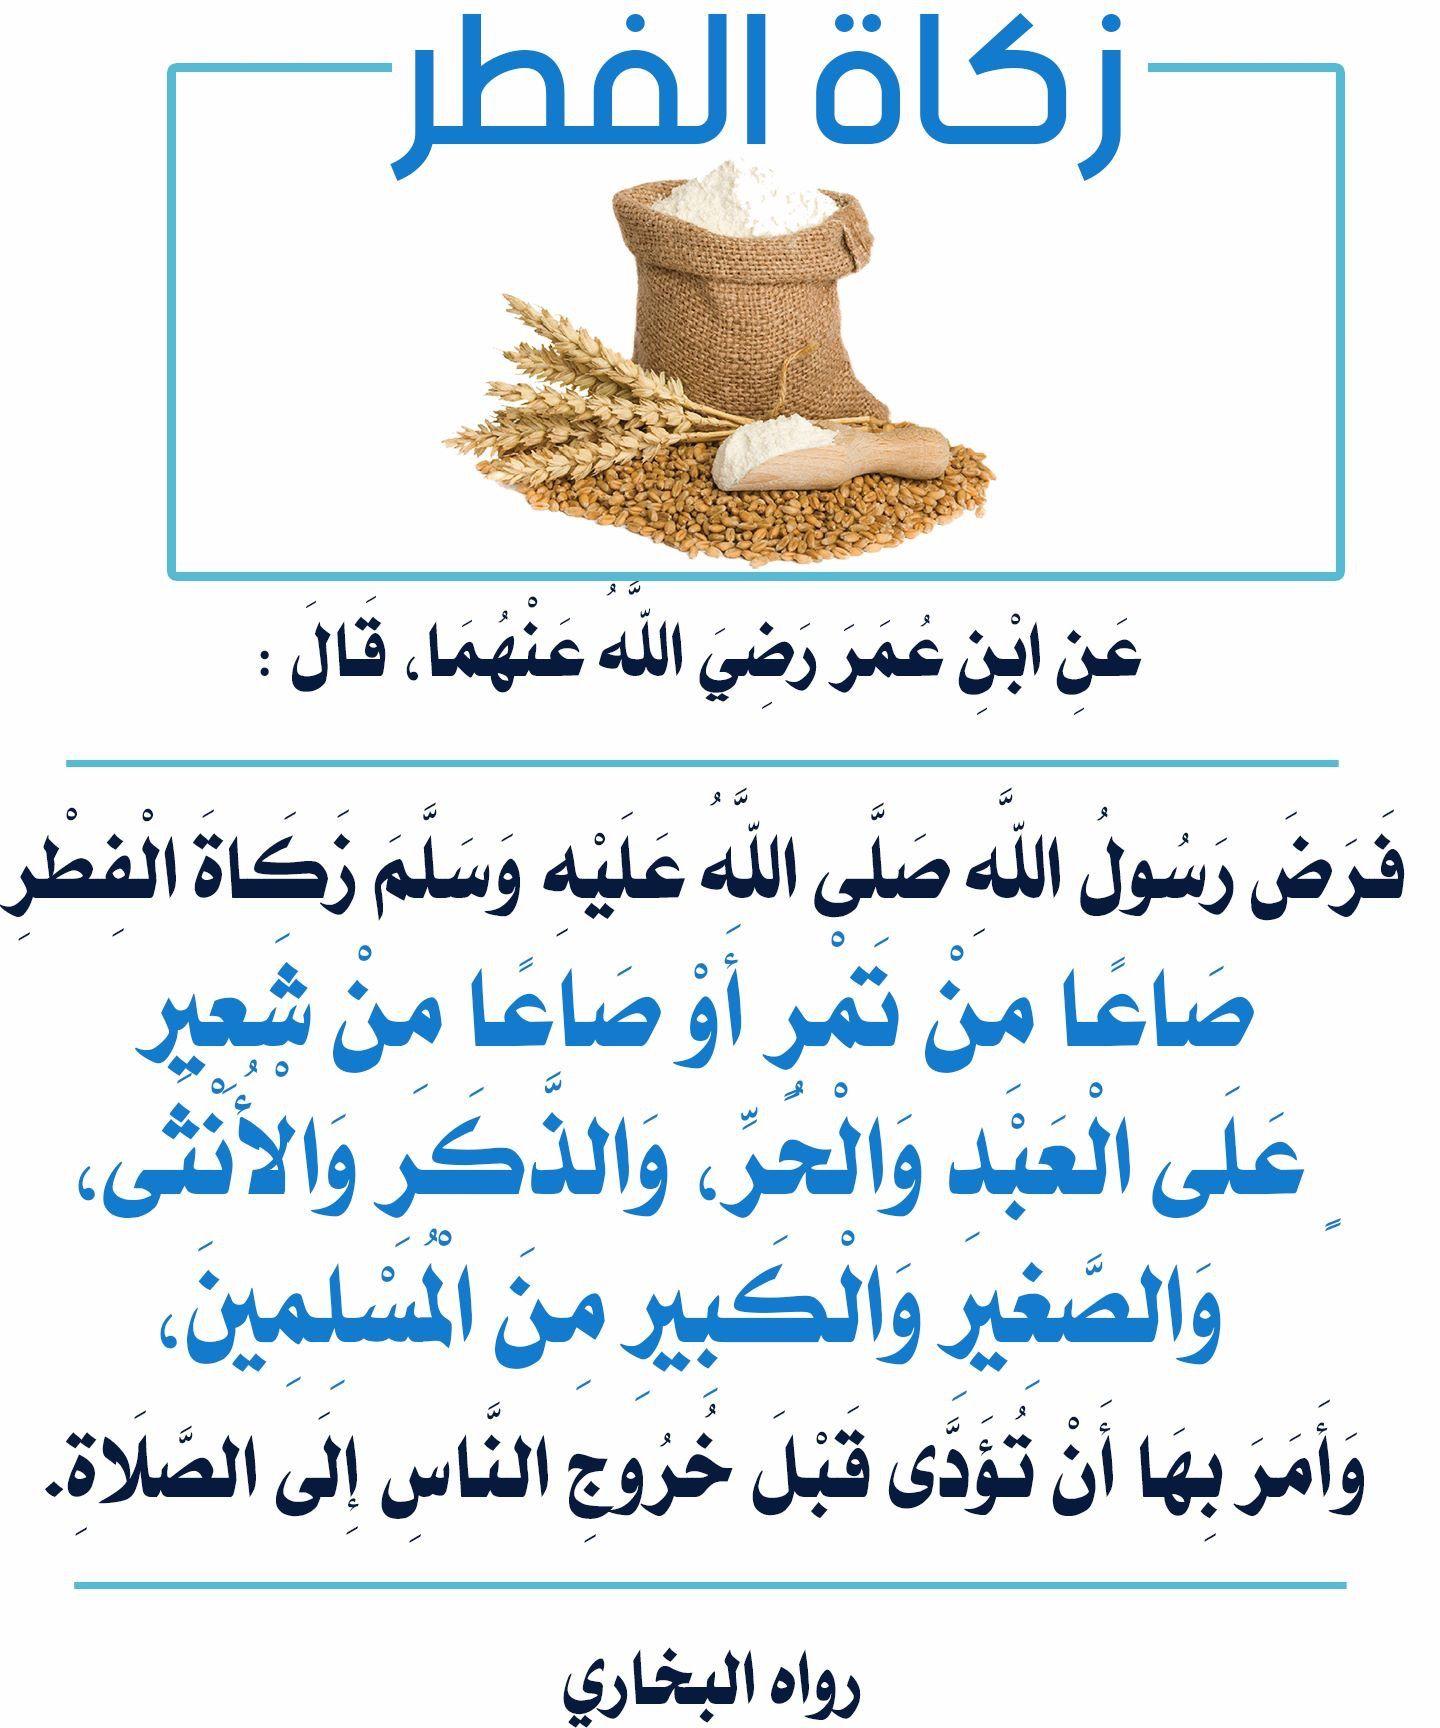 Pin By The Noble Quran On Allah God Islam Heaven Quran Miracles Prophets Islamic Posts Hadith Prayer Macca Makhah Salah Reminder Jannah Hijab Ramadan Islam Matzo